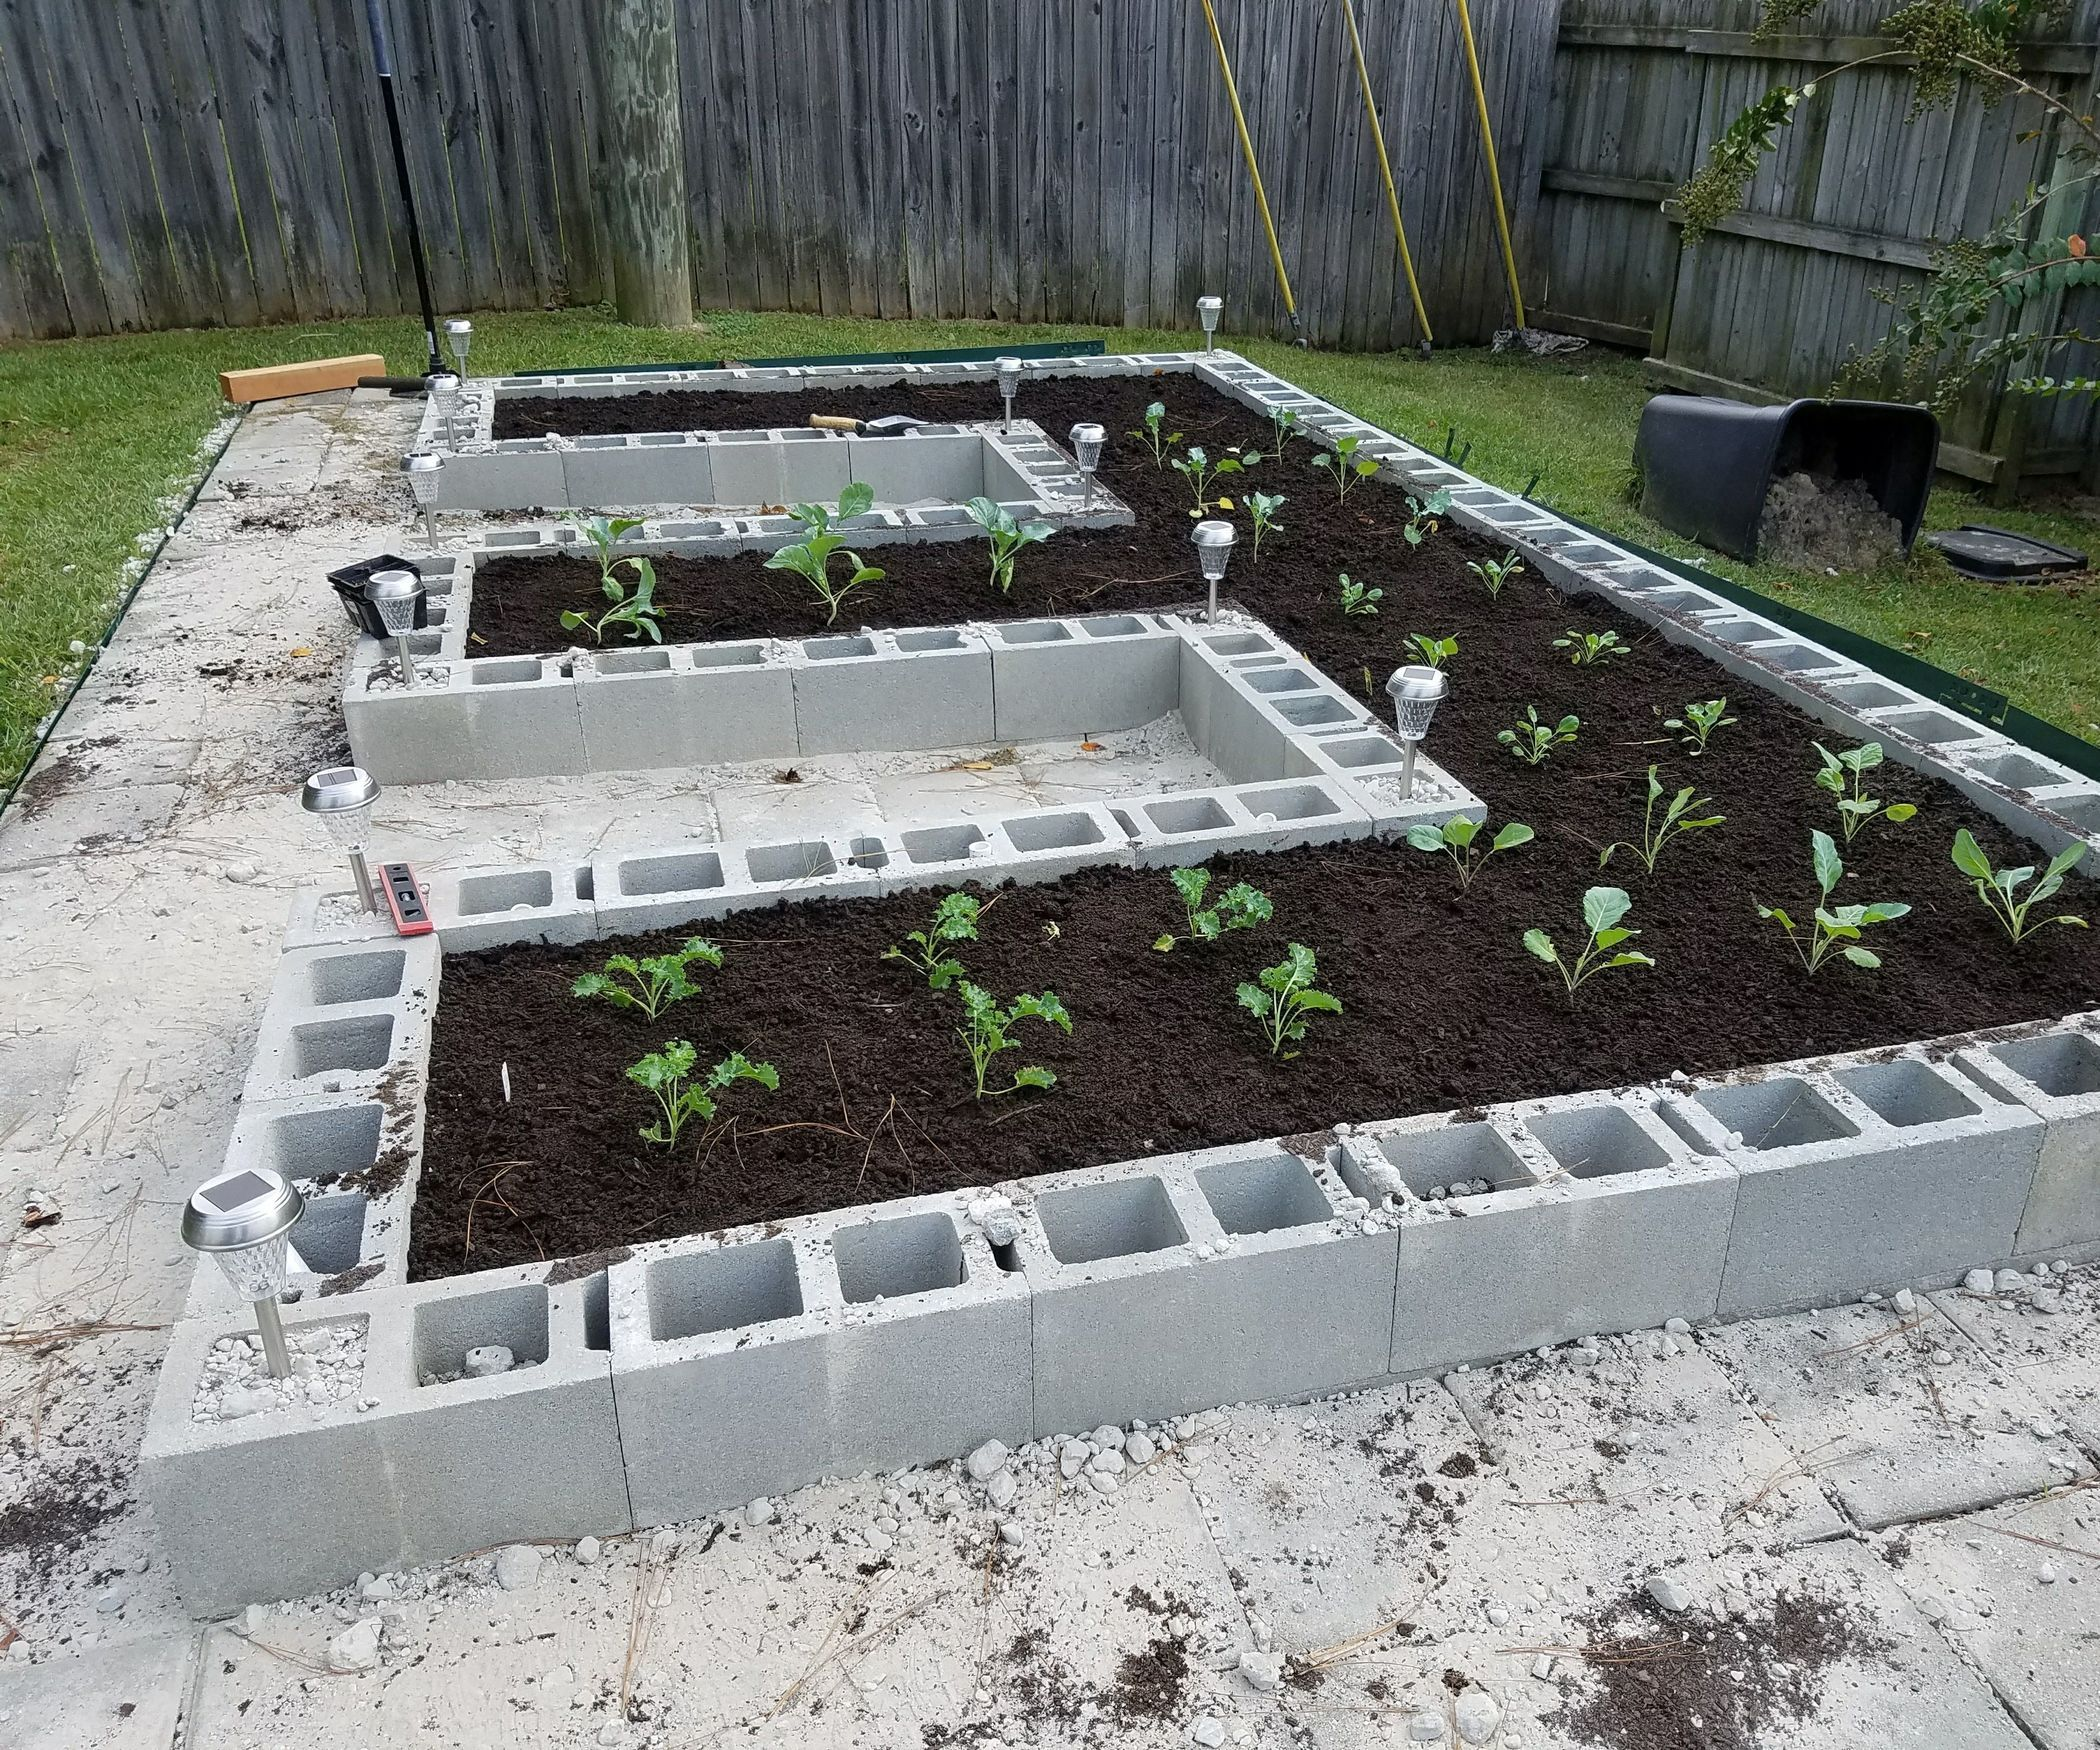 Build A Concrete Block Garden For Food And Memories Vegetable Garden Raised Beds Building A Raised Garden Cinder Block Garden